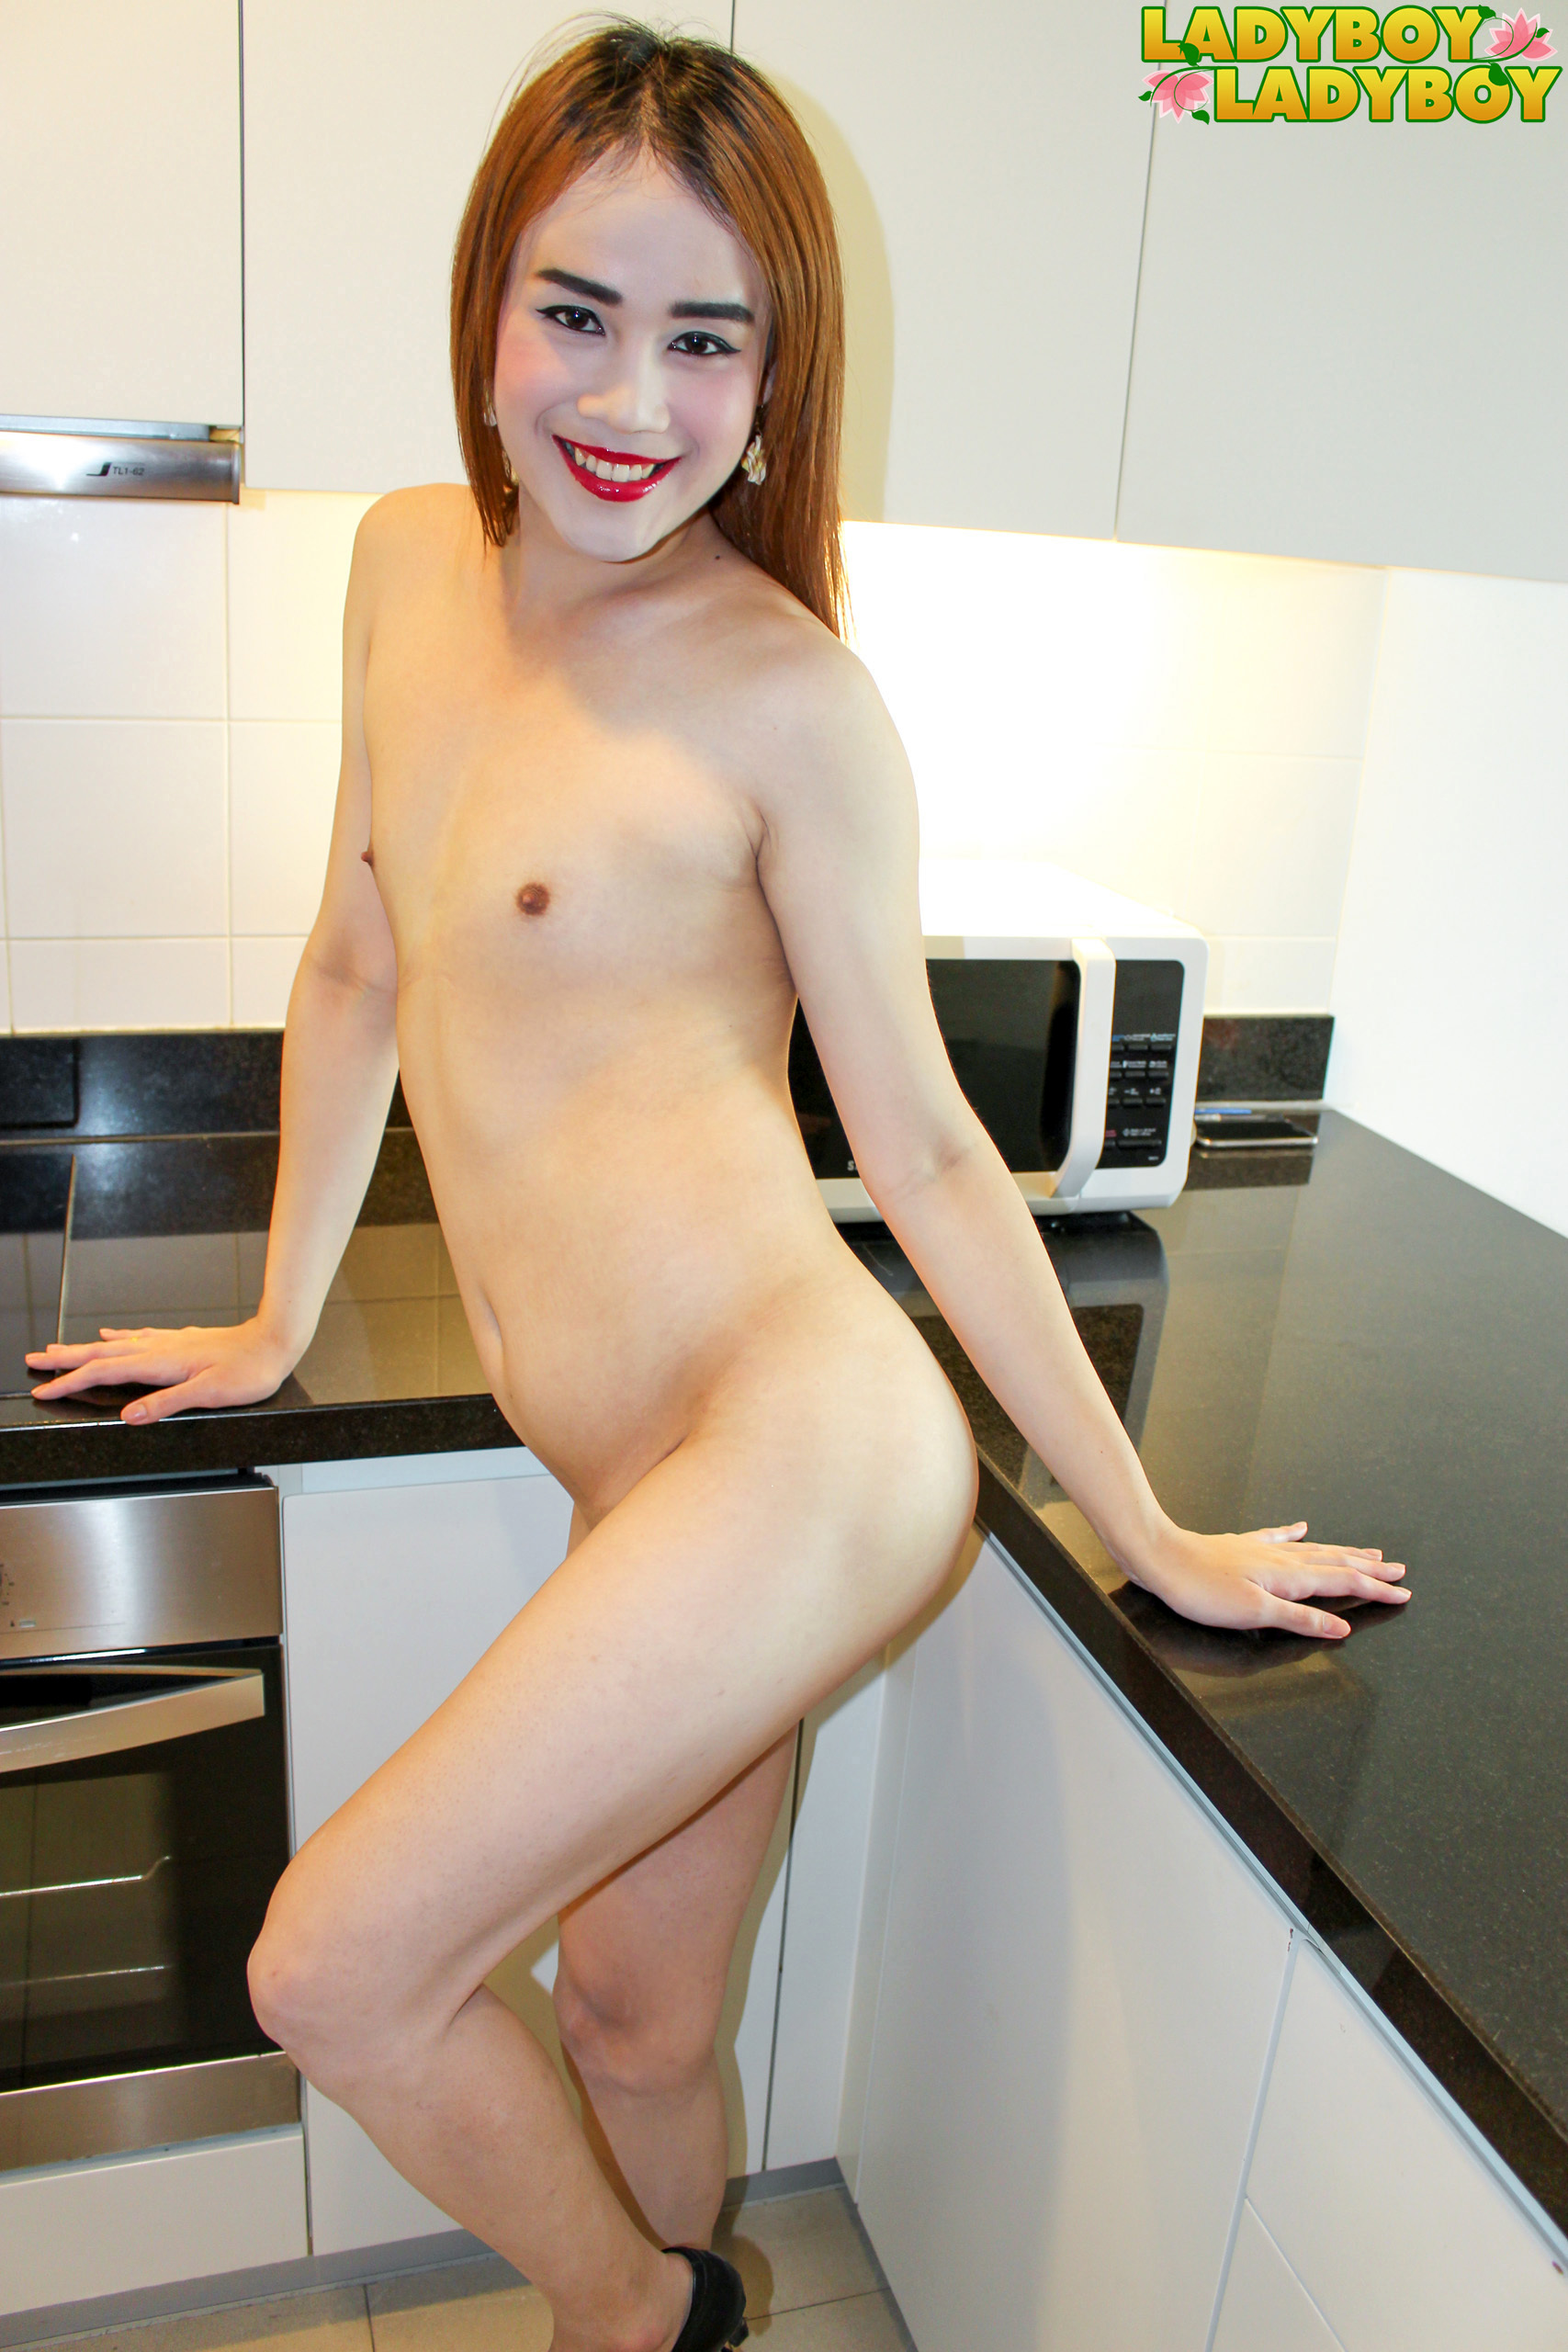 Moo's Flirtatious Kitchen Solo!